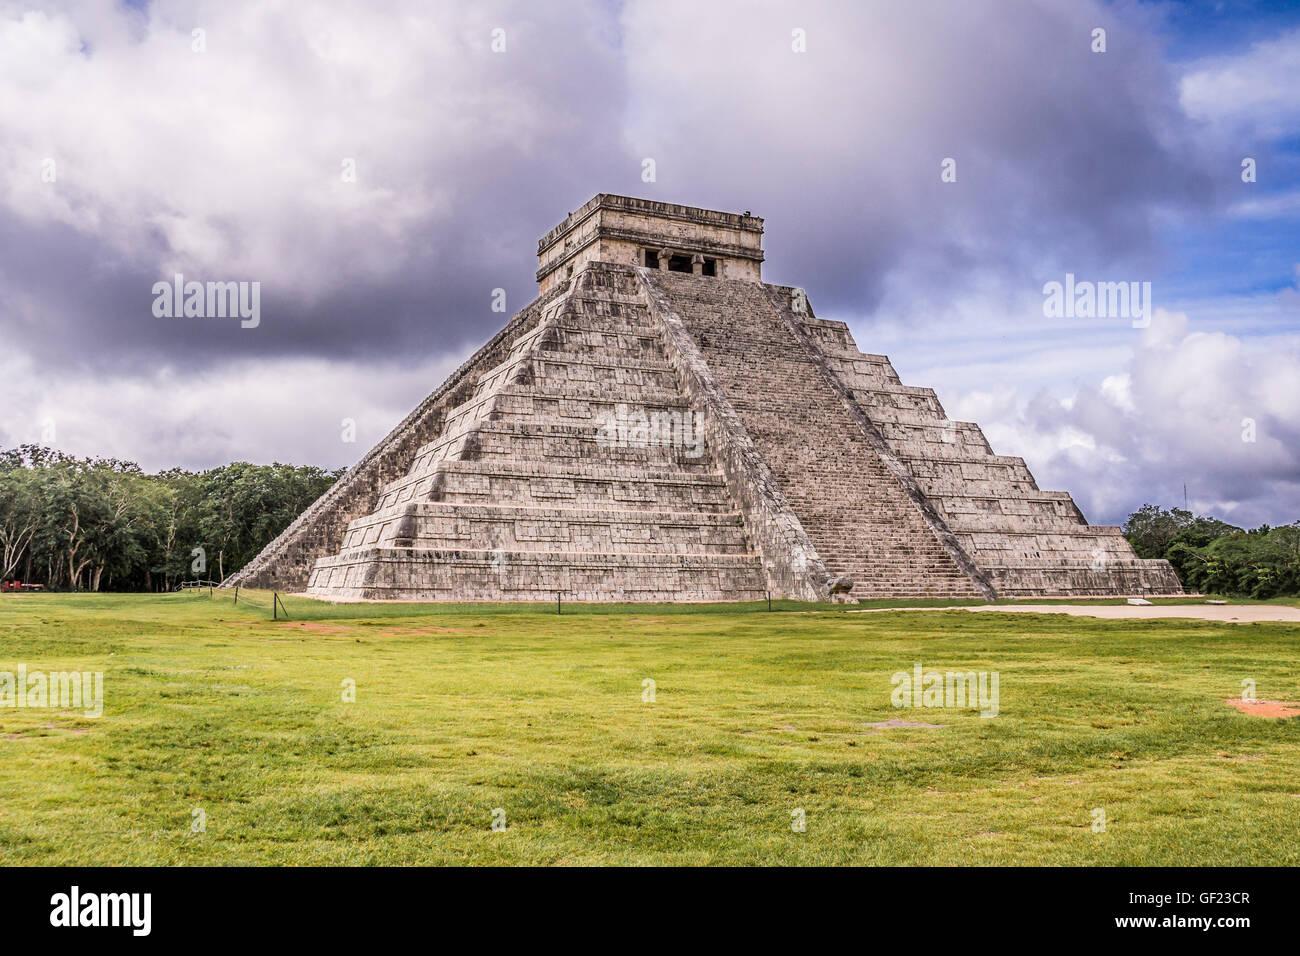 Maya pyramid Chichen Itza, Yucatan, Mexico - Stock Image